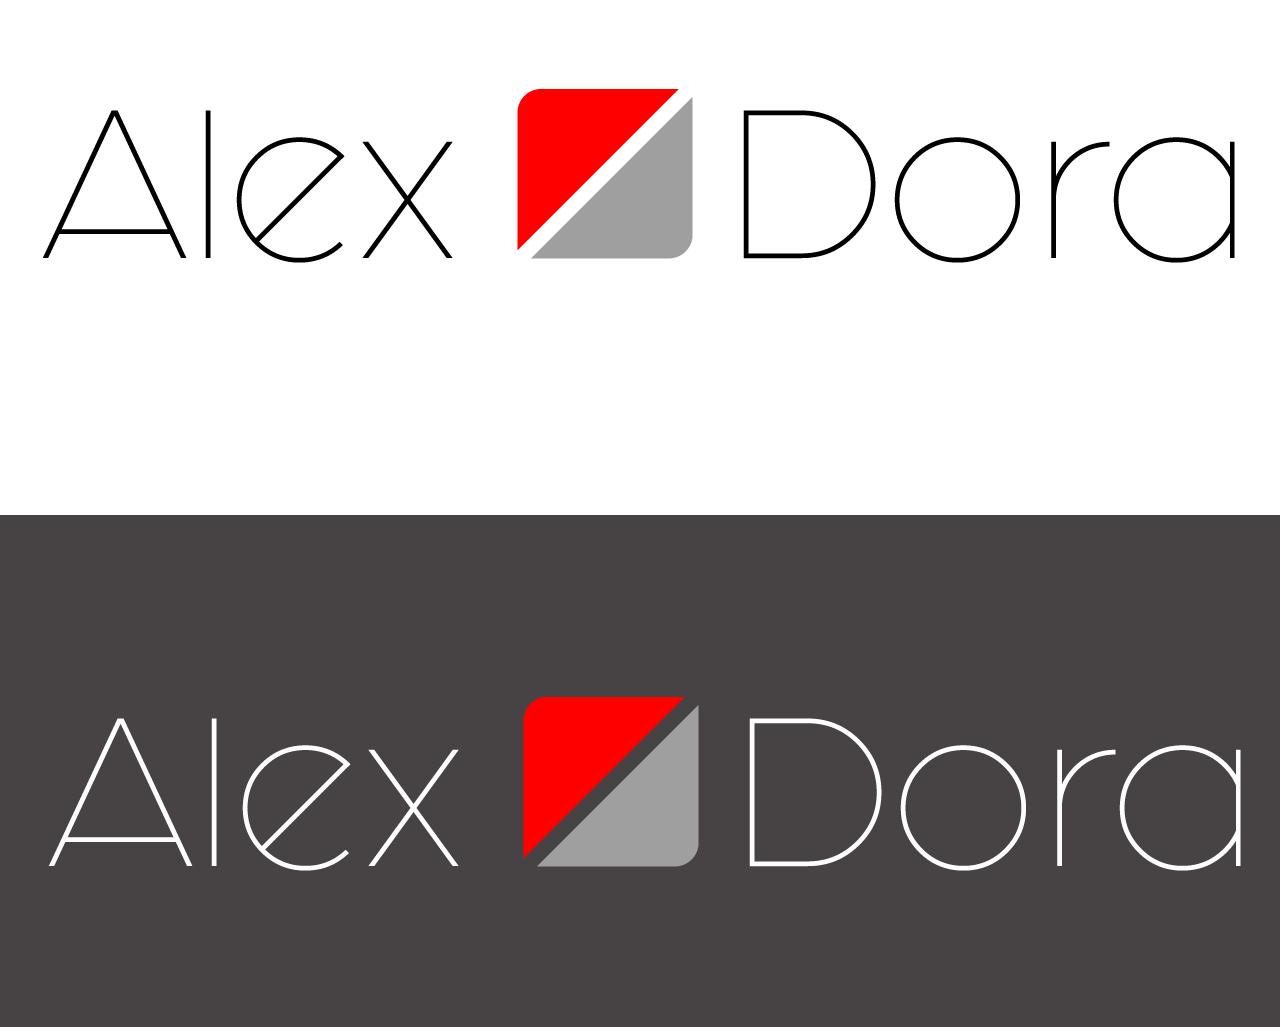 Необходим дизайнер для доработки логотипа бренда одежды фото f_9125b38fa41056fa.png